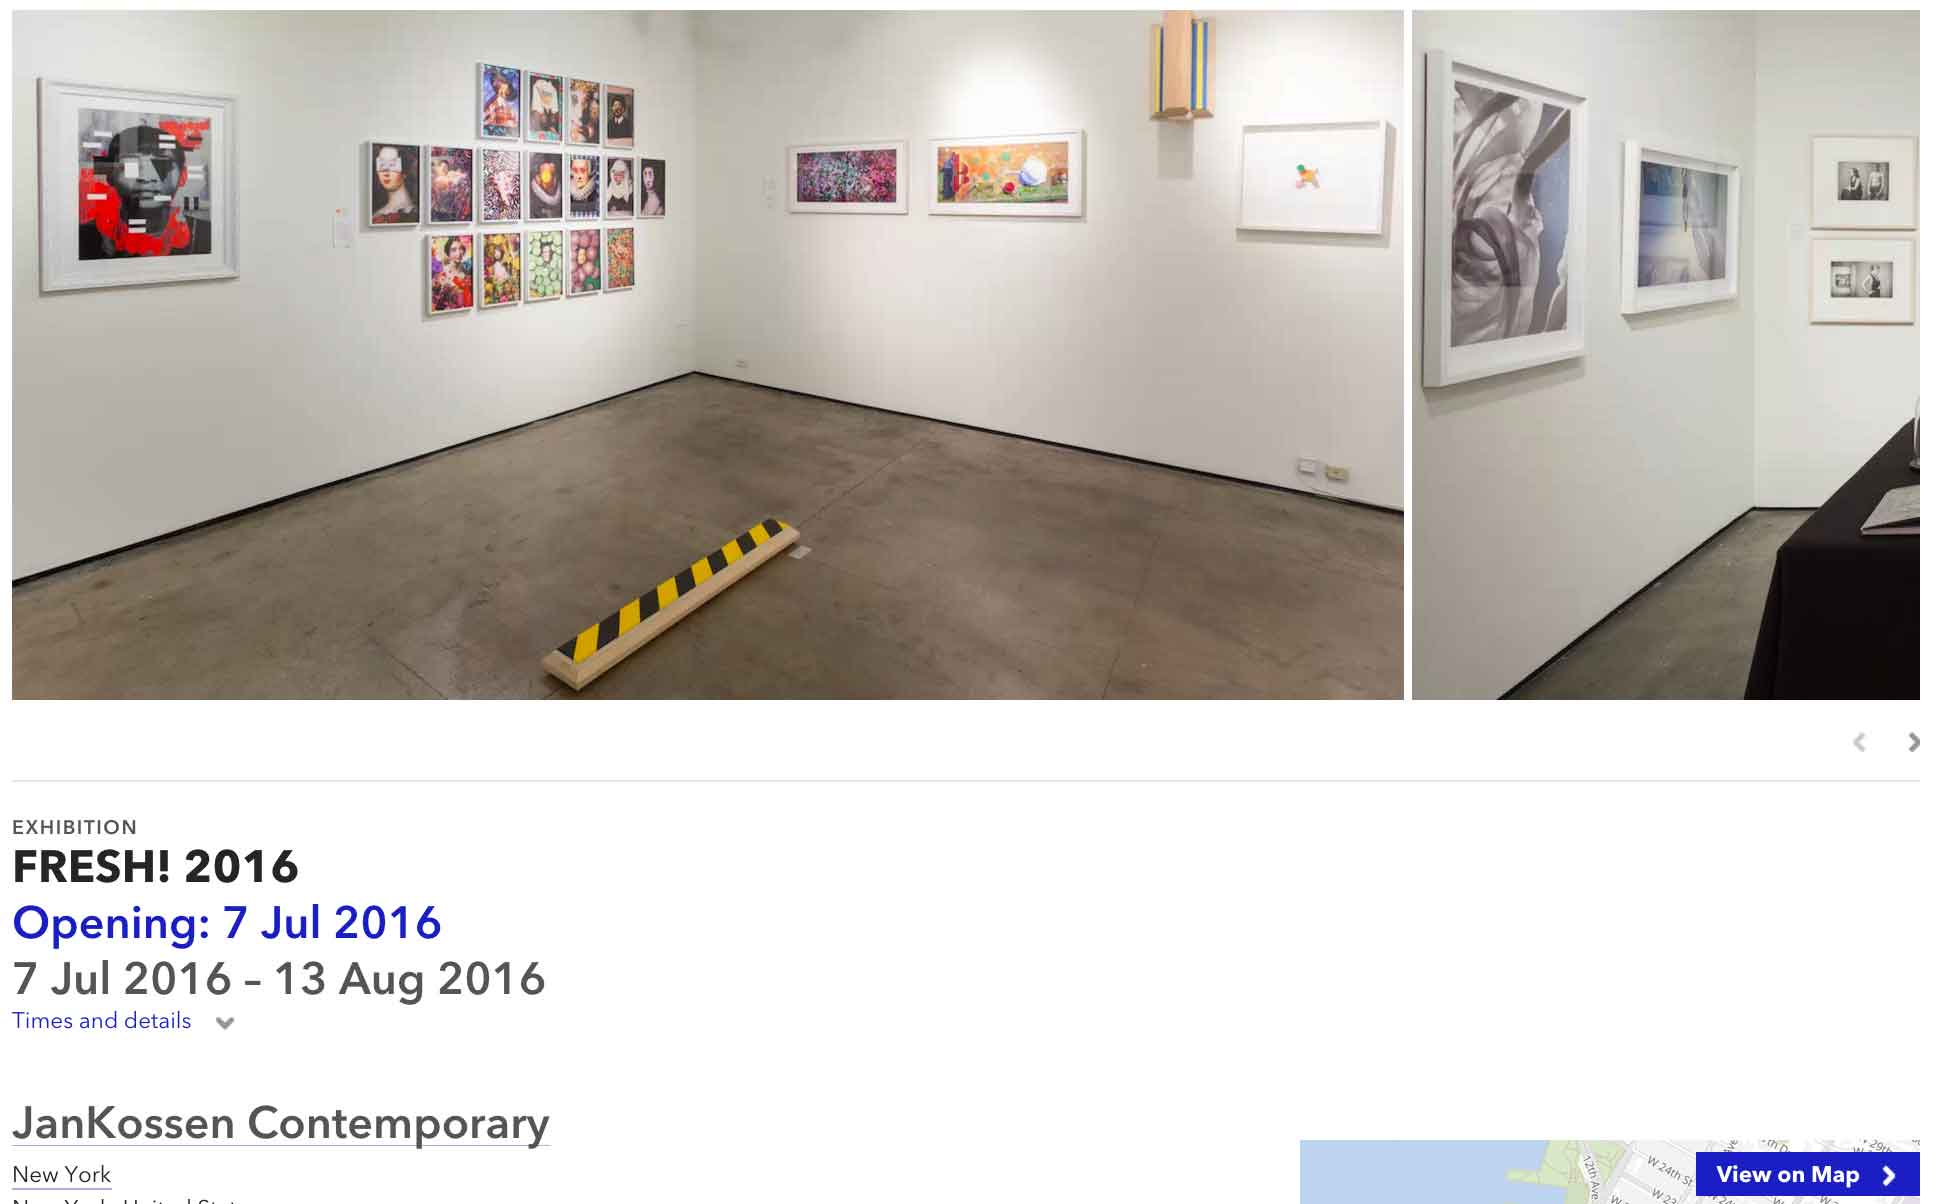 ULTRADISTANCIA at FRESH! exhibition. JanKossen Gallery New York. Installation Shot.